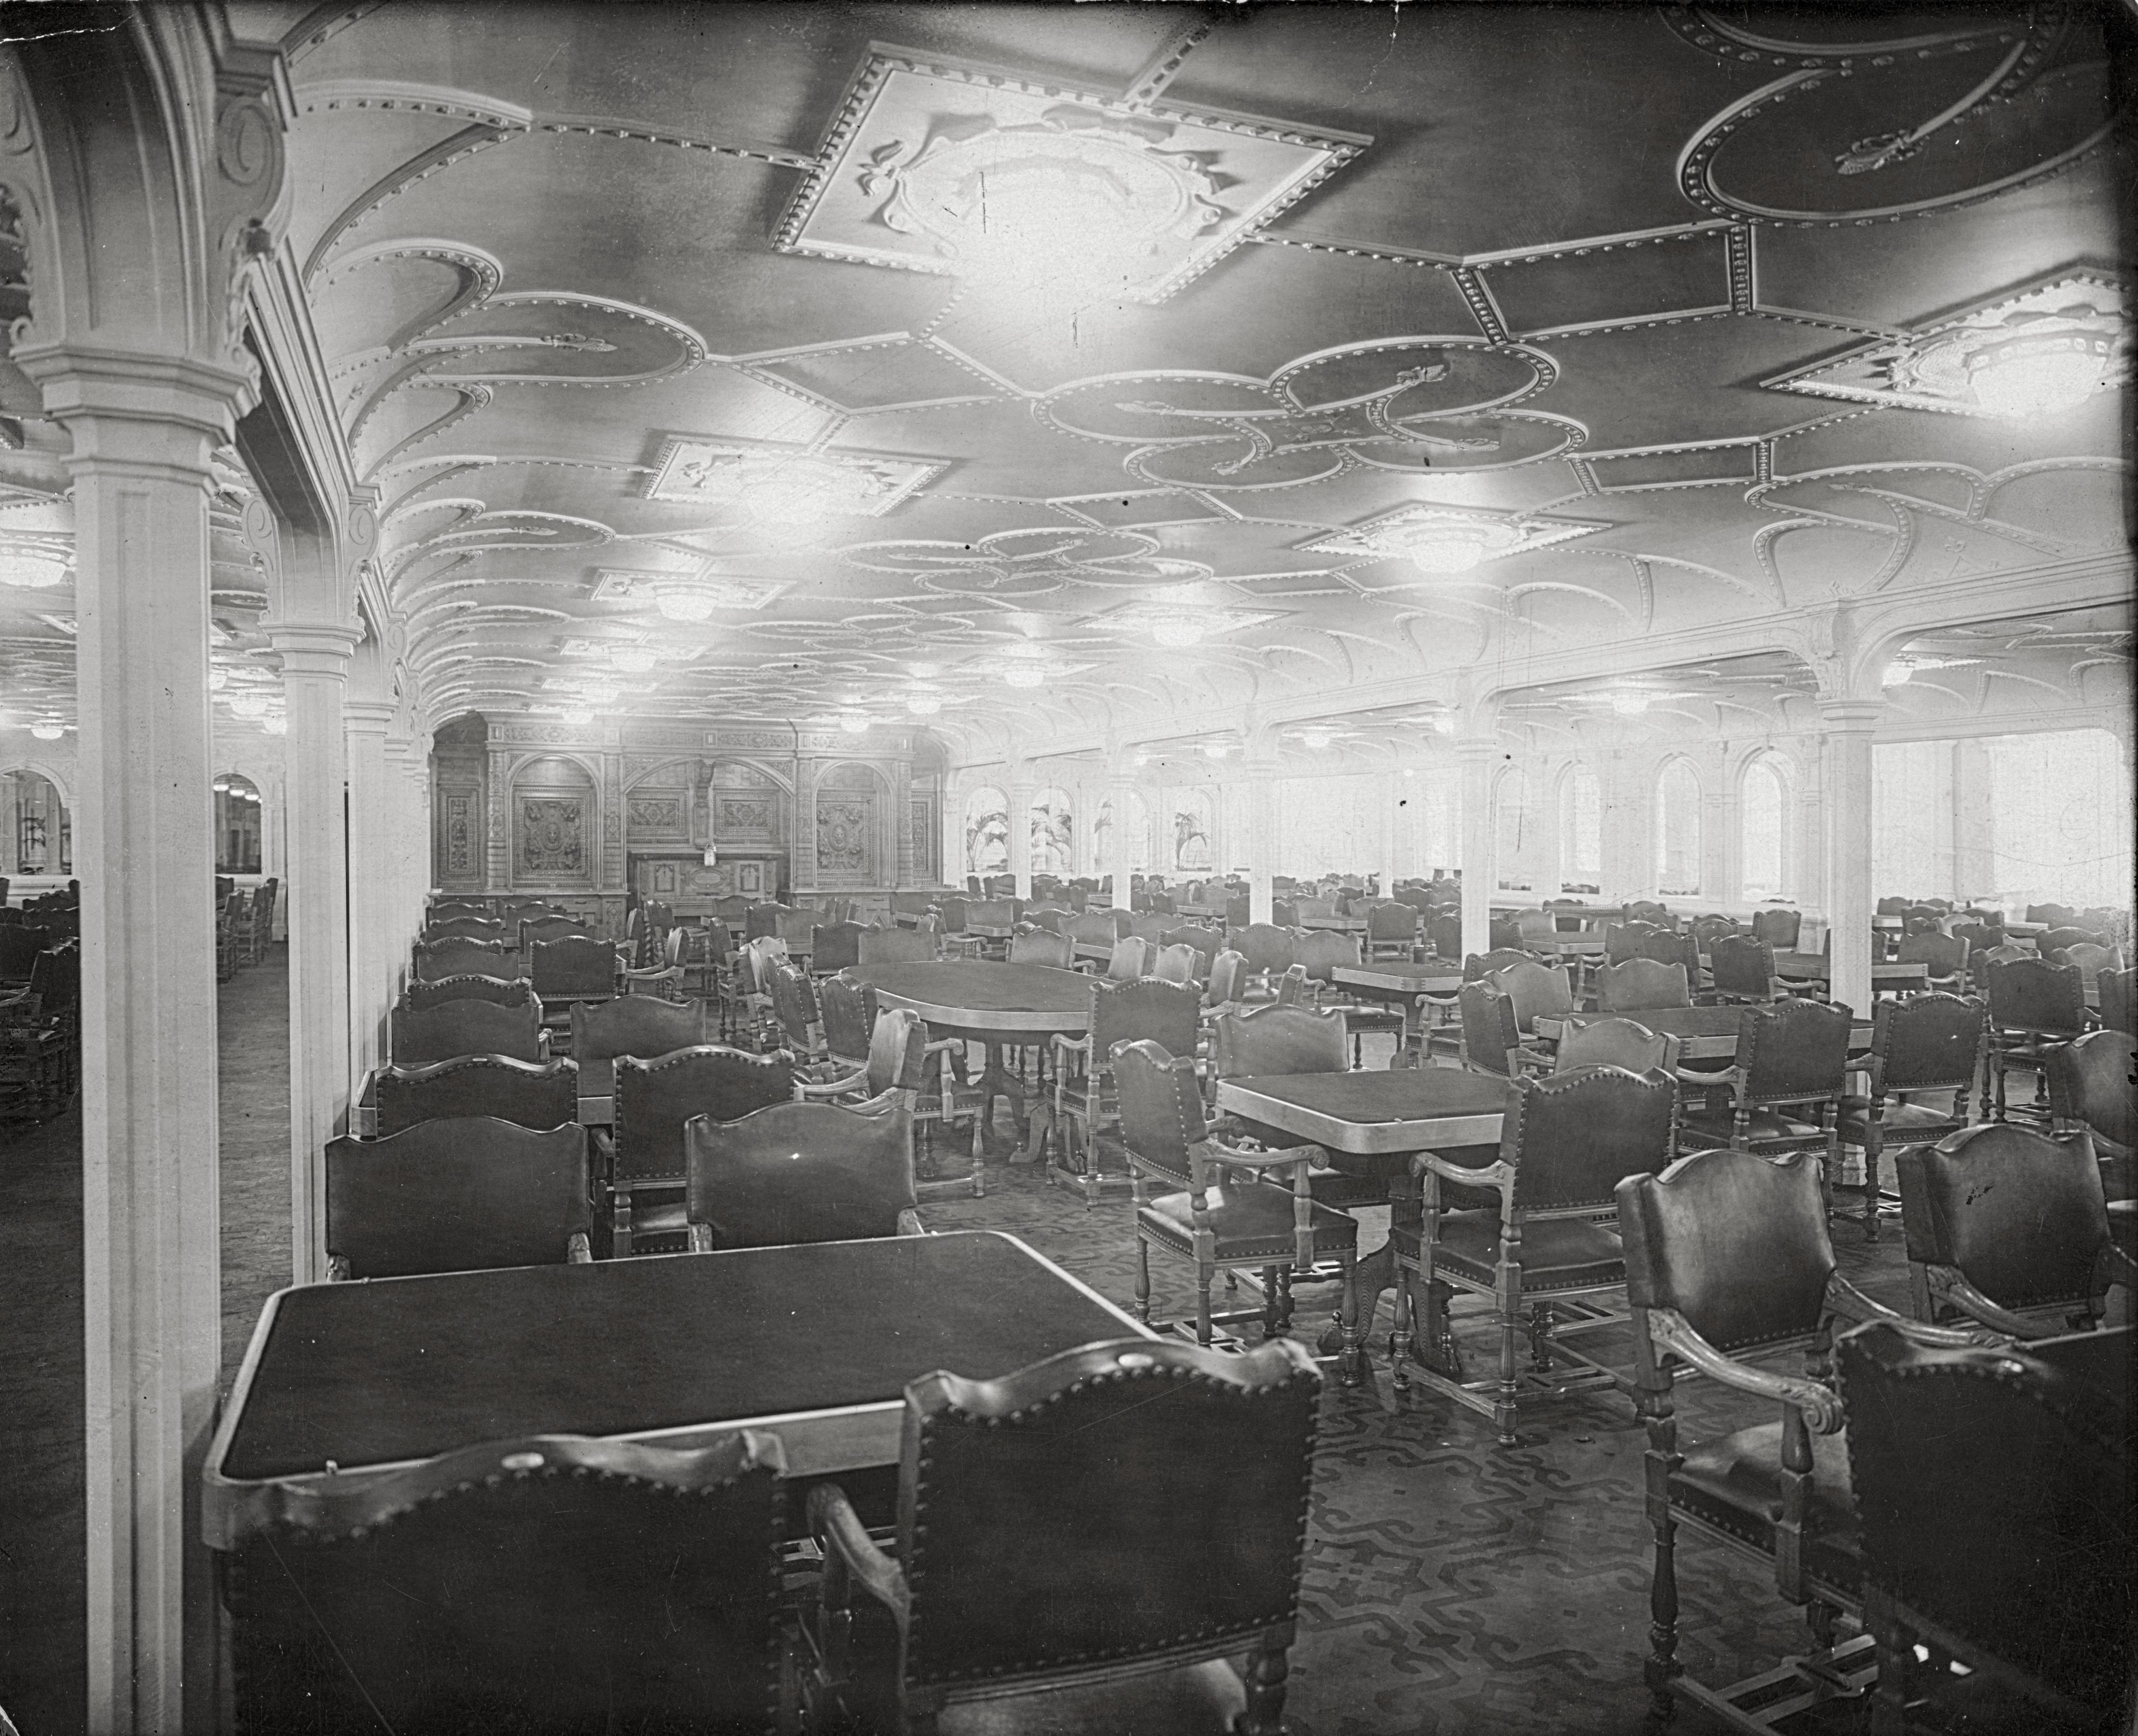 Titanic Movie Dining Room